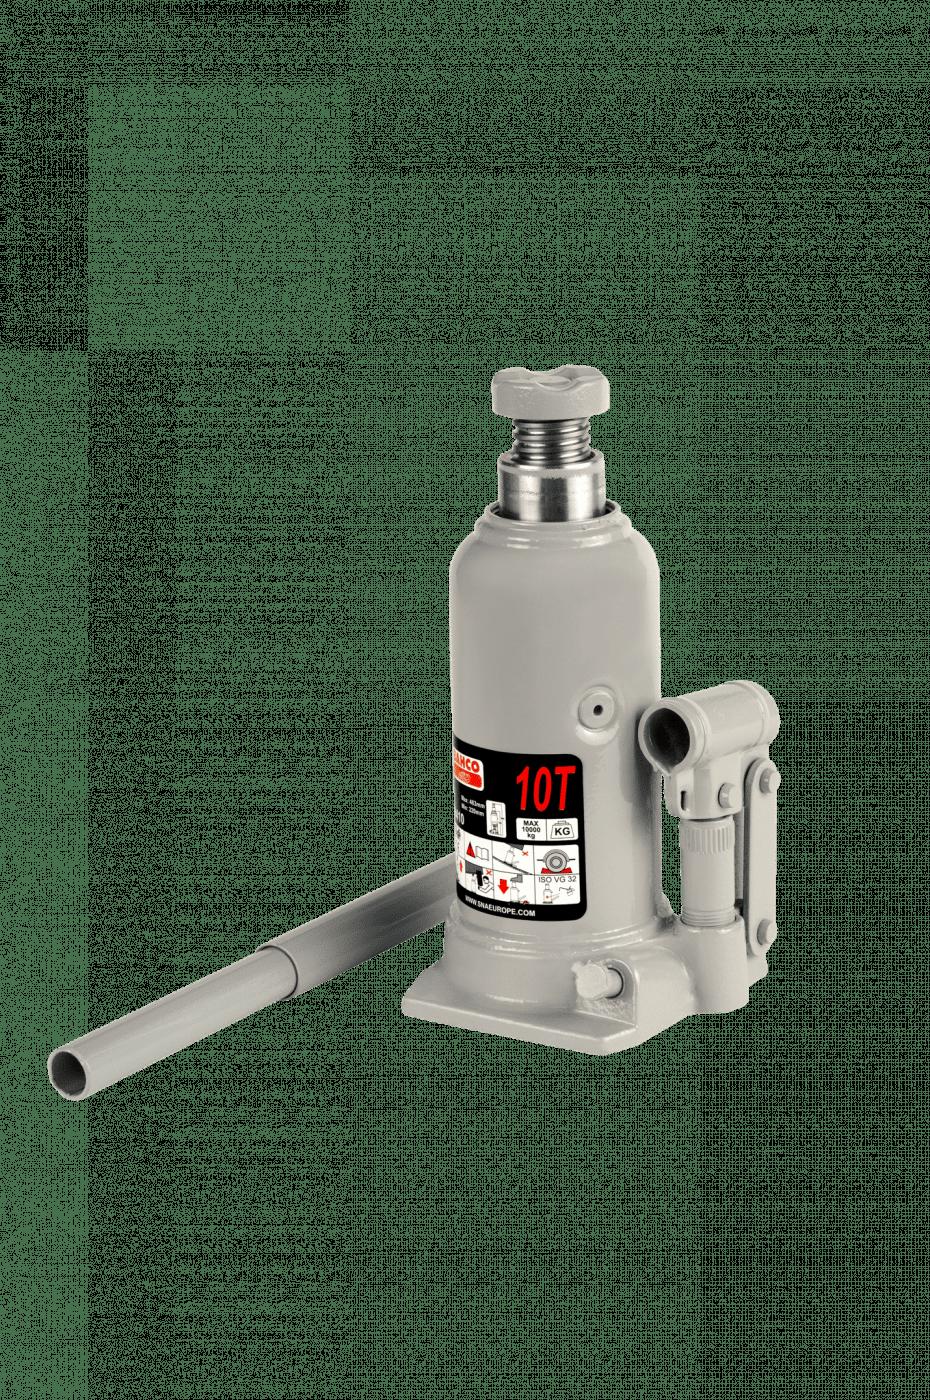 Gato botella soldado 5T -